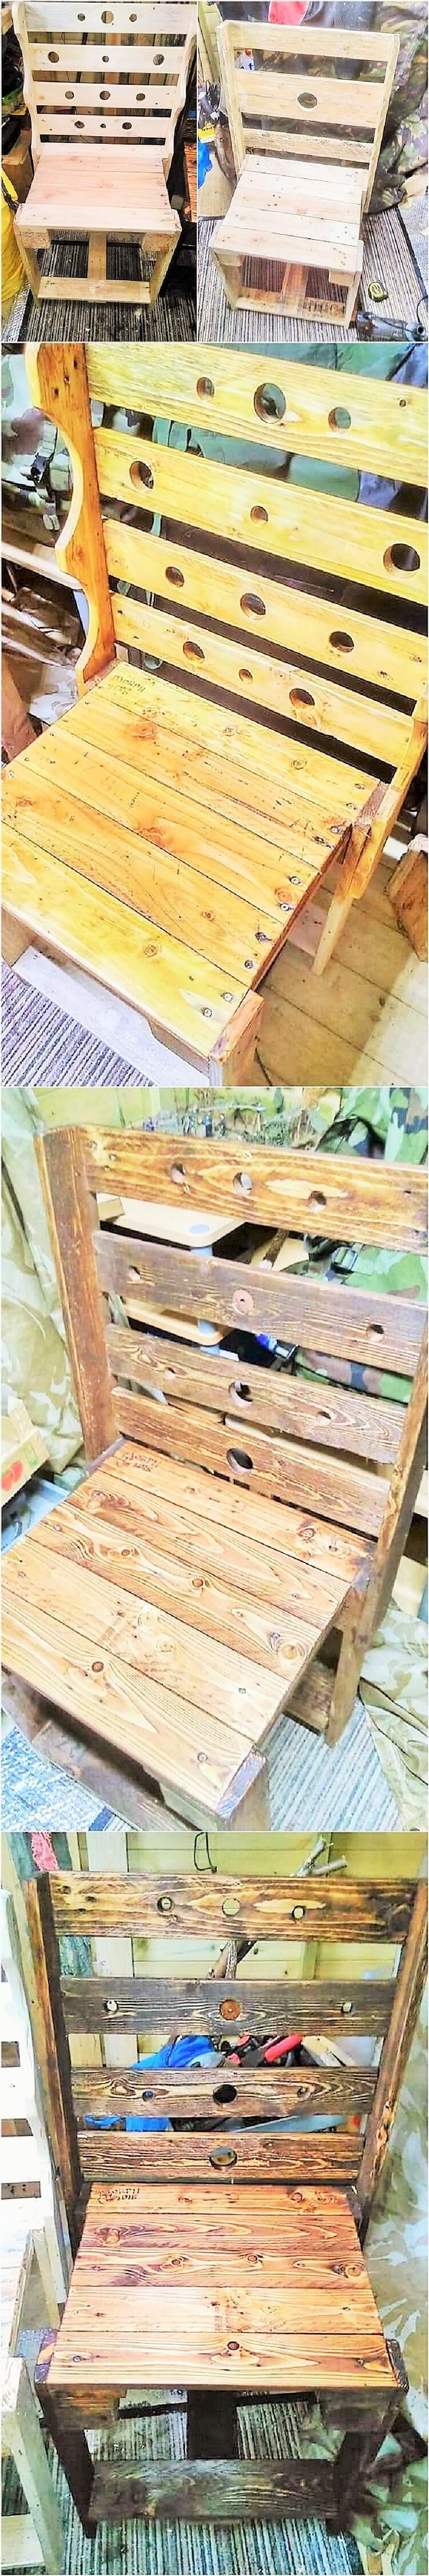 wooden pallet Diy chair